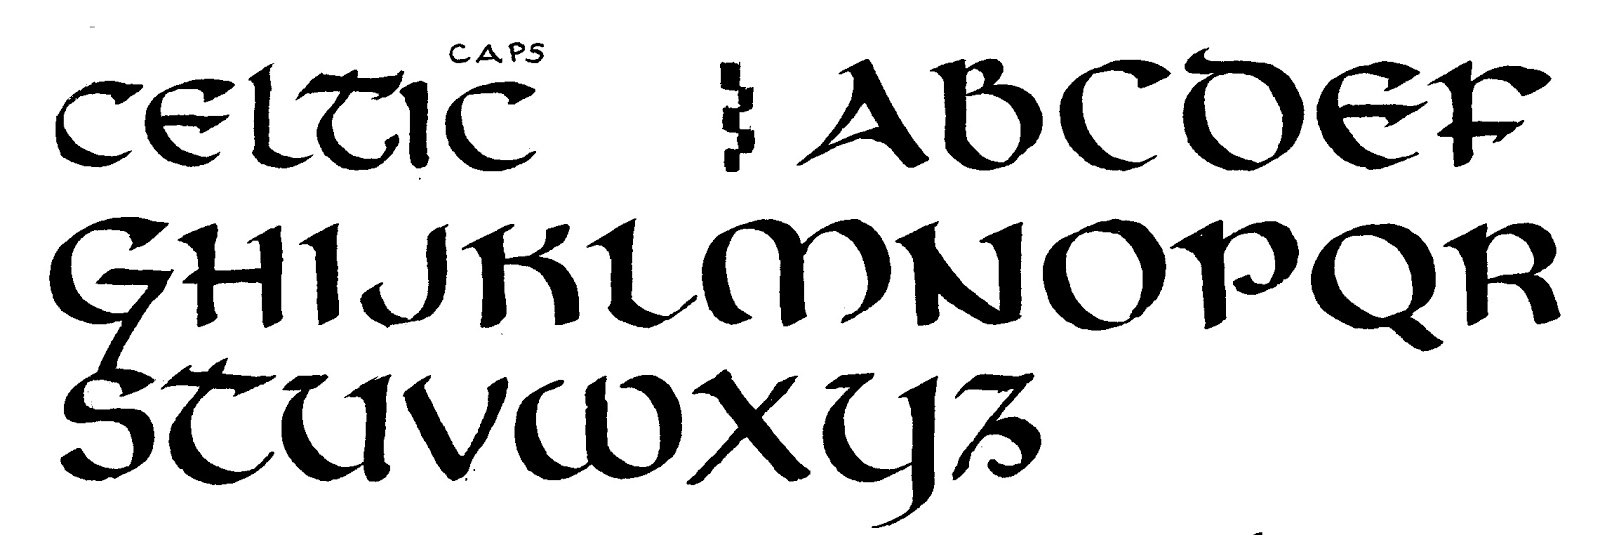 Celtic Lettering Alphabet